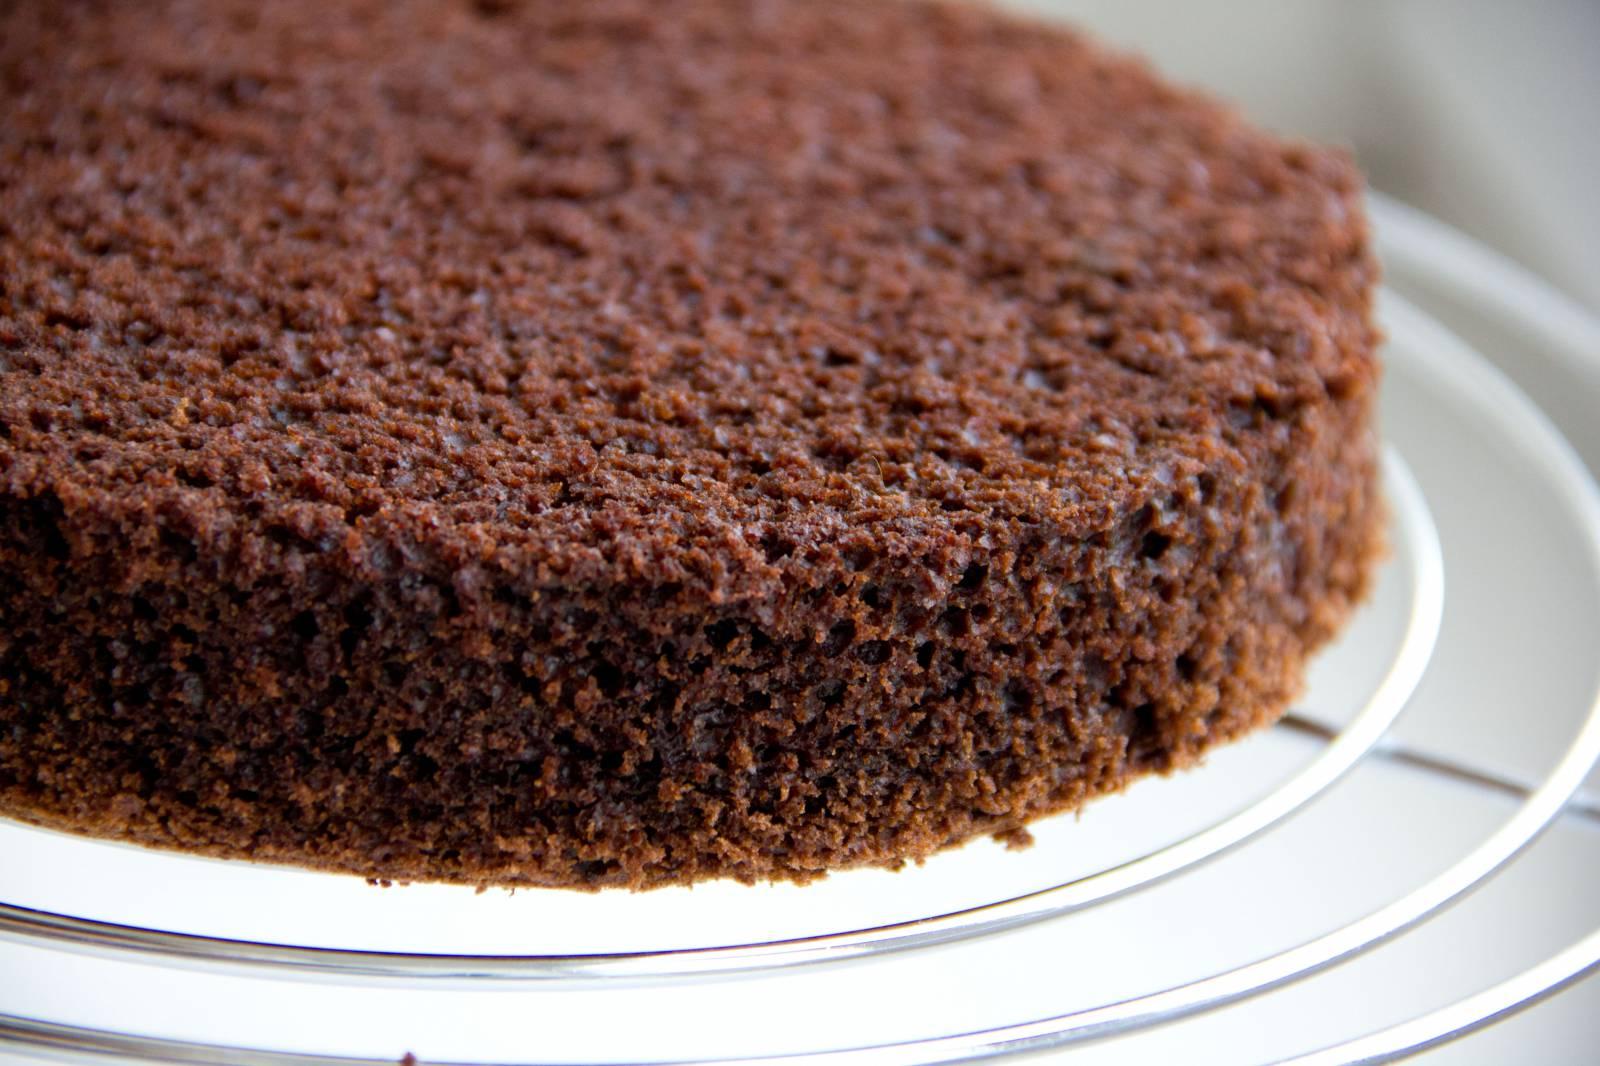 торт на кипятке рецепт в мультиварке редмонд